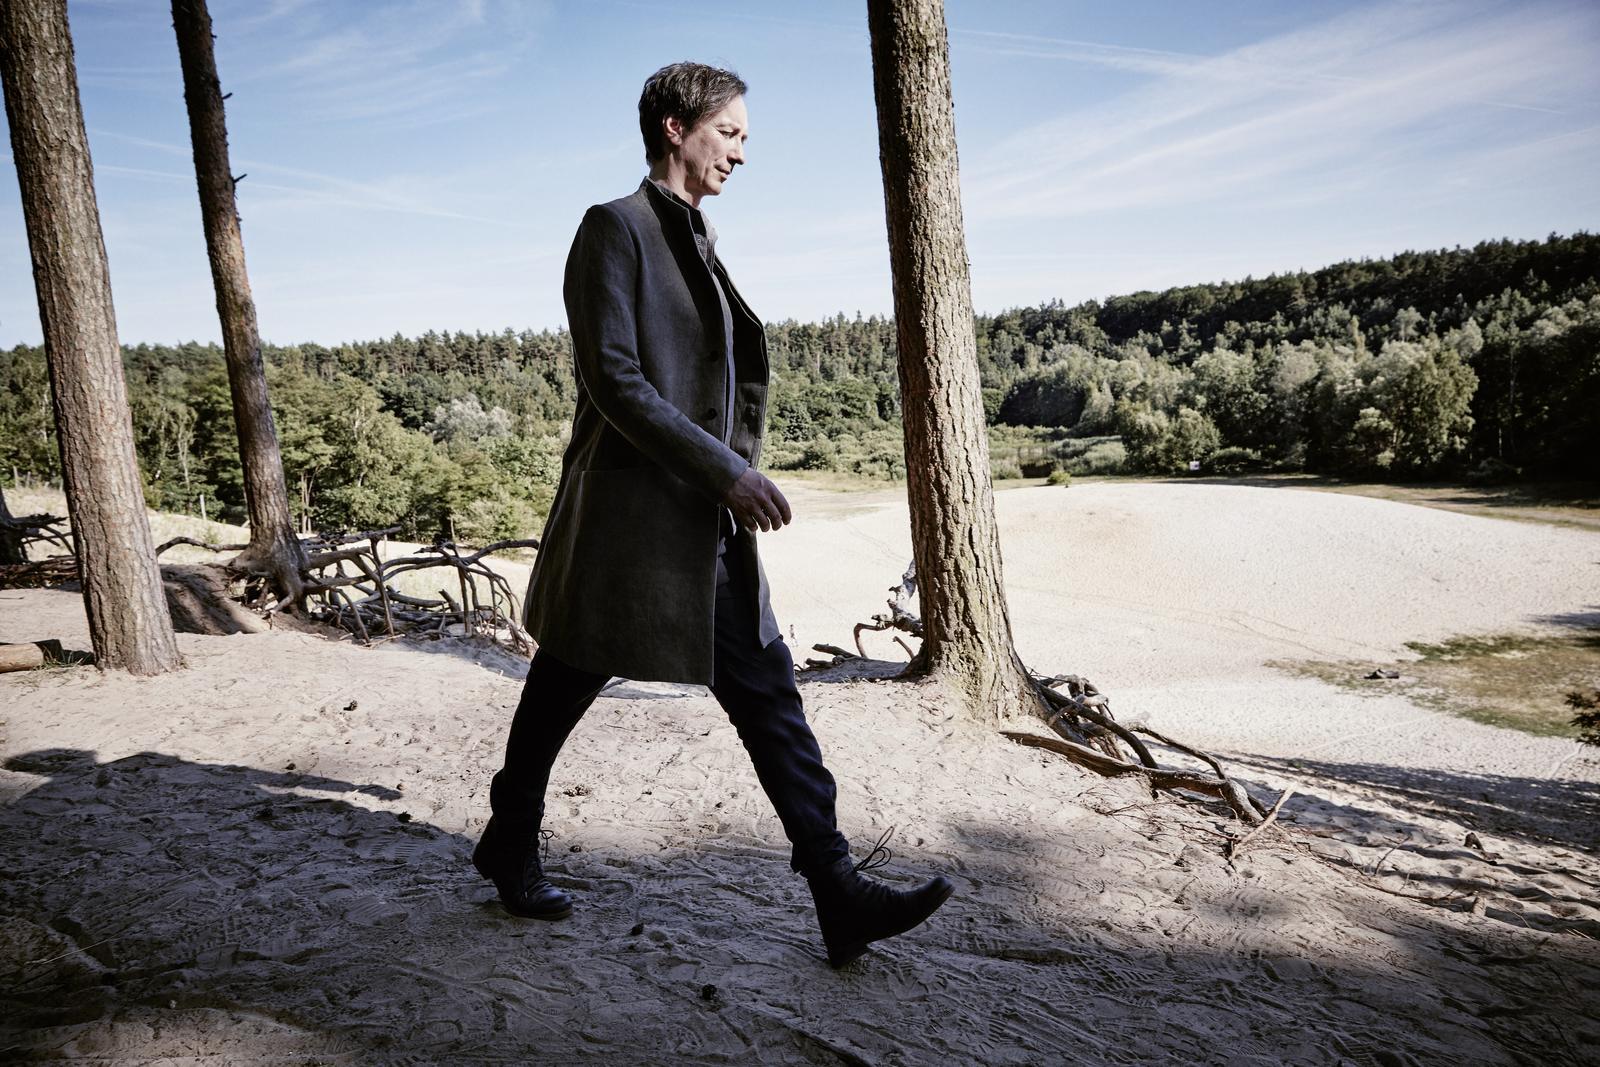 Hauschka Wald Gregor Hohenberg alt